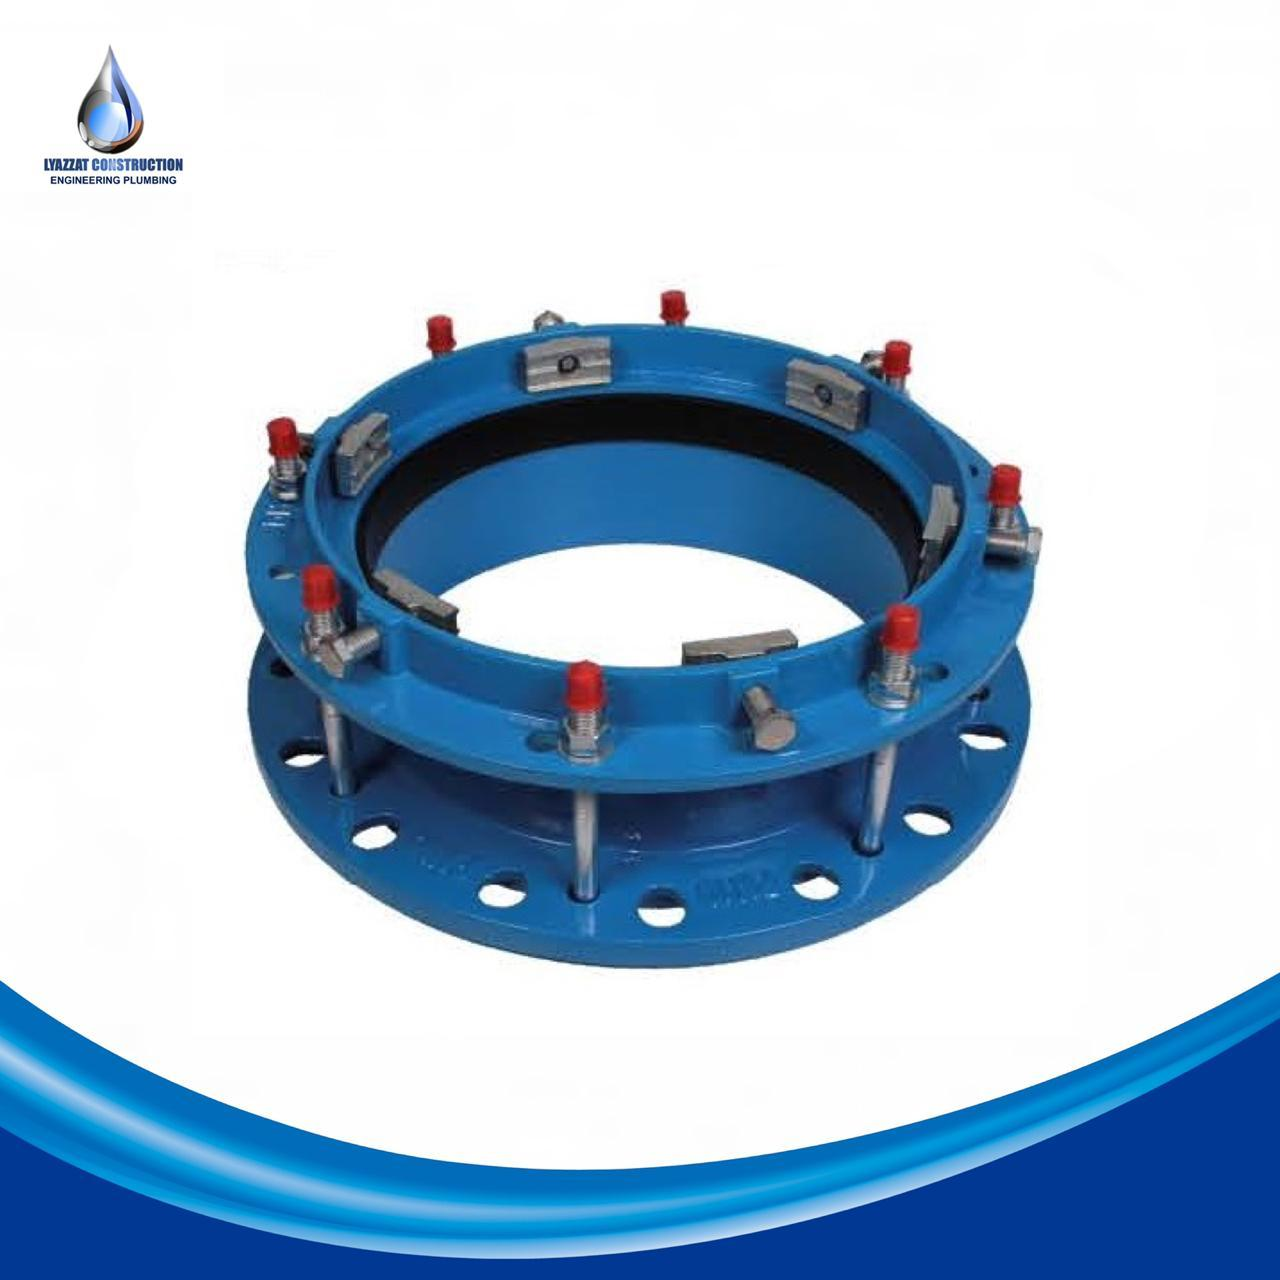 Фланец фиксирующий для ПЭ и ПВХ труб DN 100/90 PN10-16